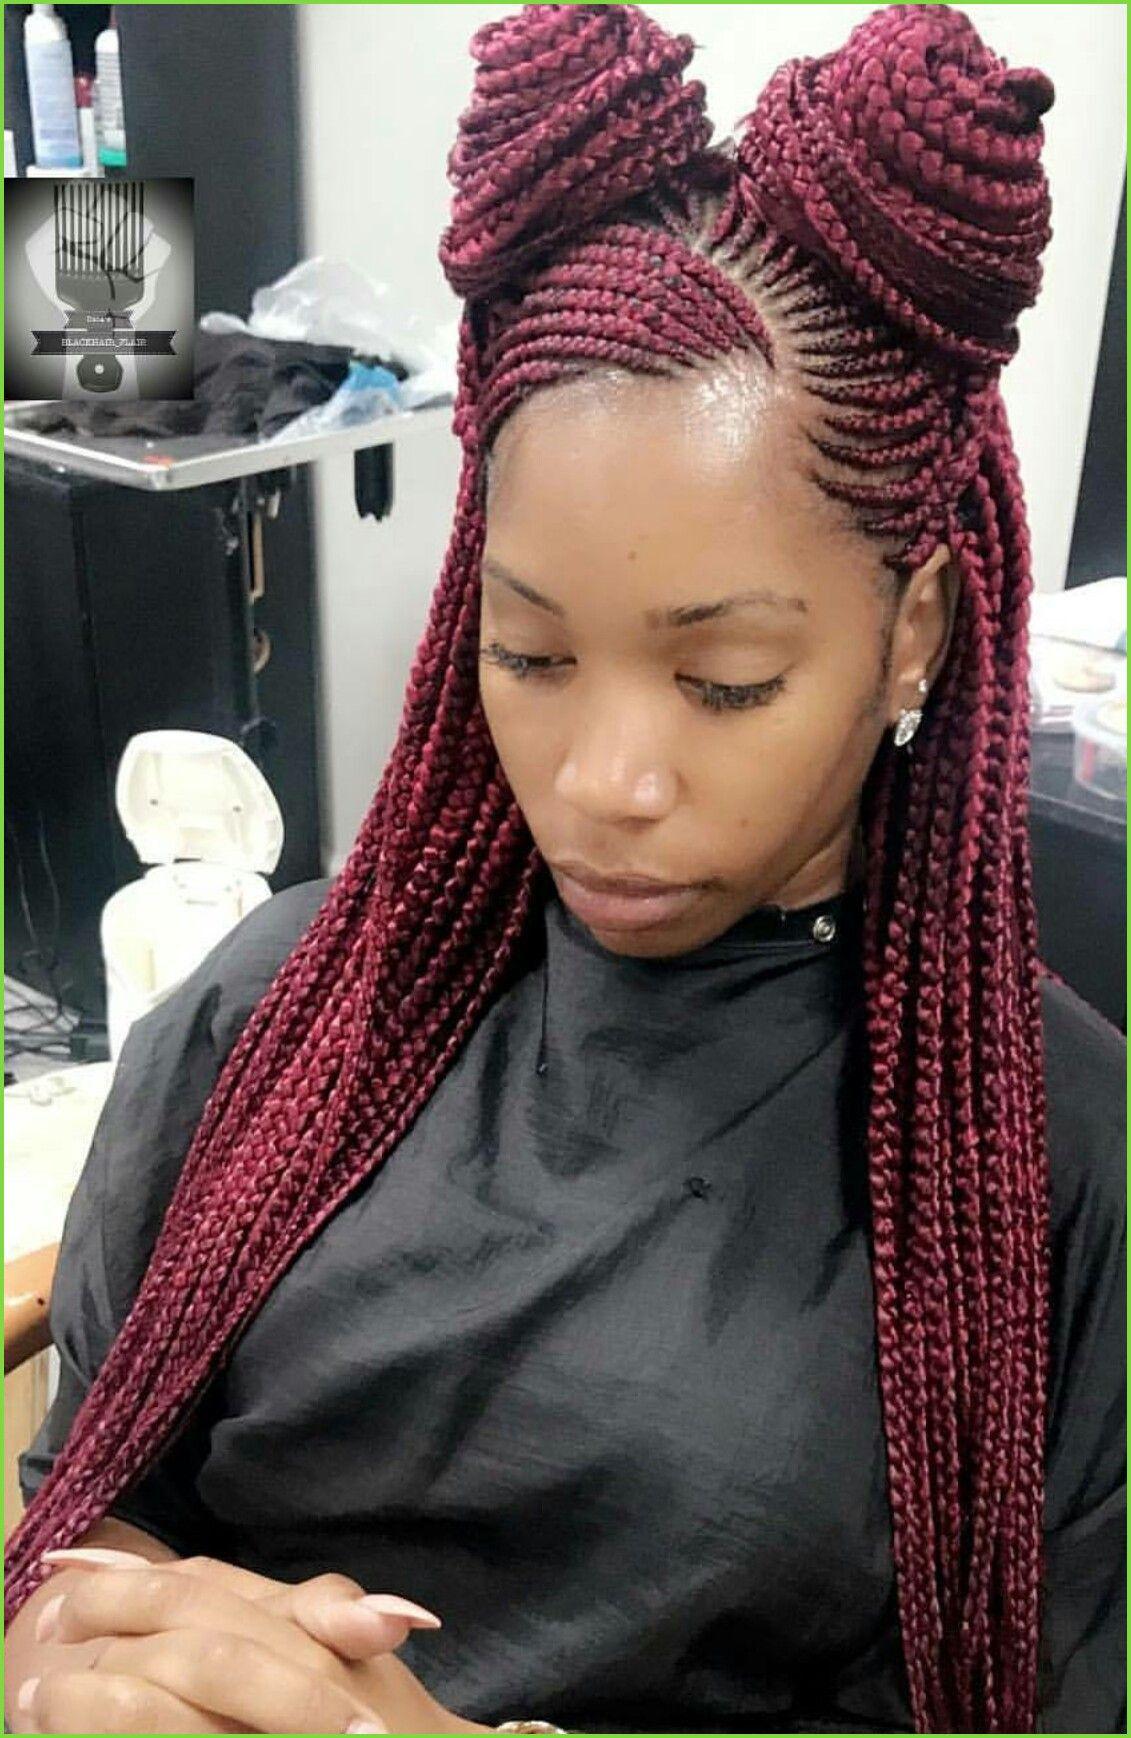 25 Braid Hair Extensions Styles Braided Hairstyles African Braids Hairstyles Hair Styles